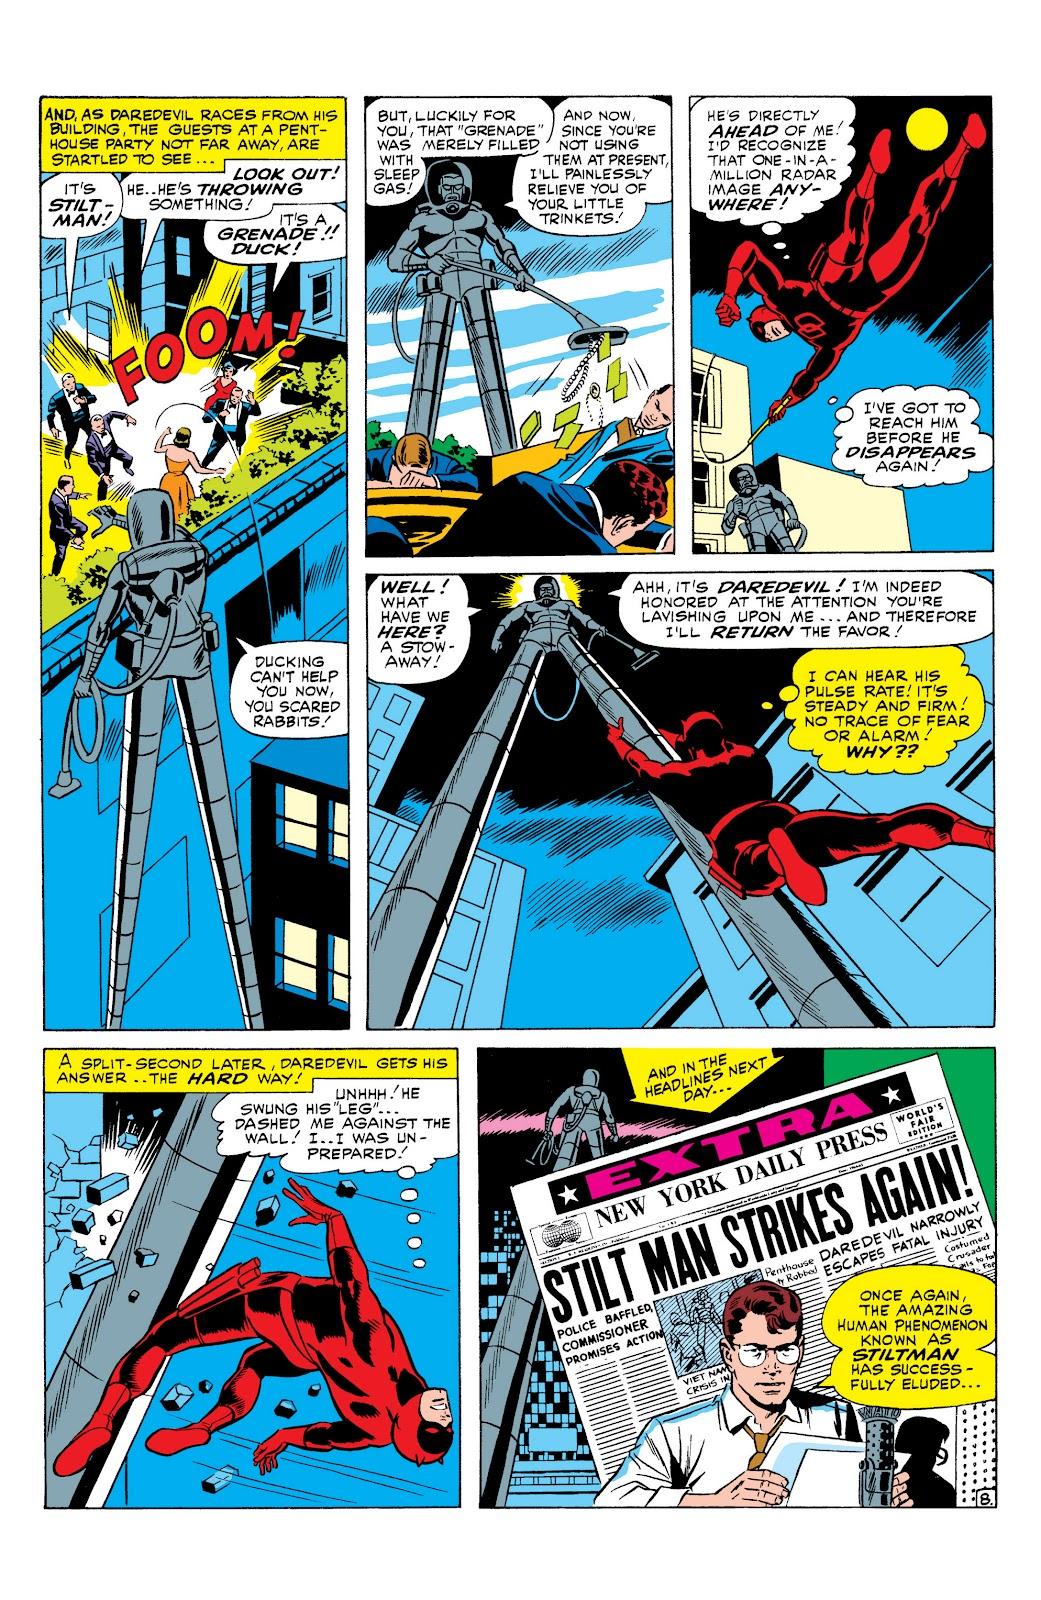 Read online Marvel Masterworks: Daredevil comic - Issue # TPB 1 (Part 2) - 72